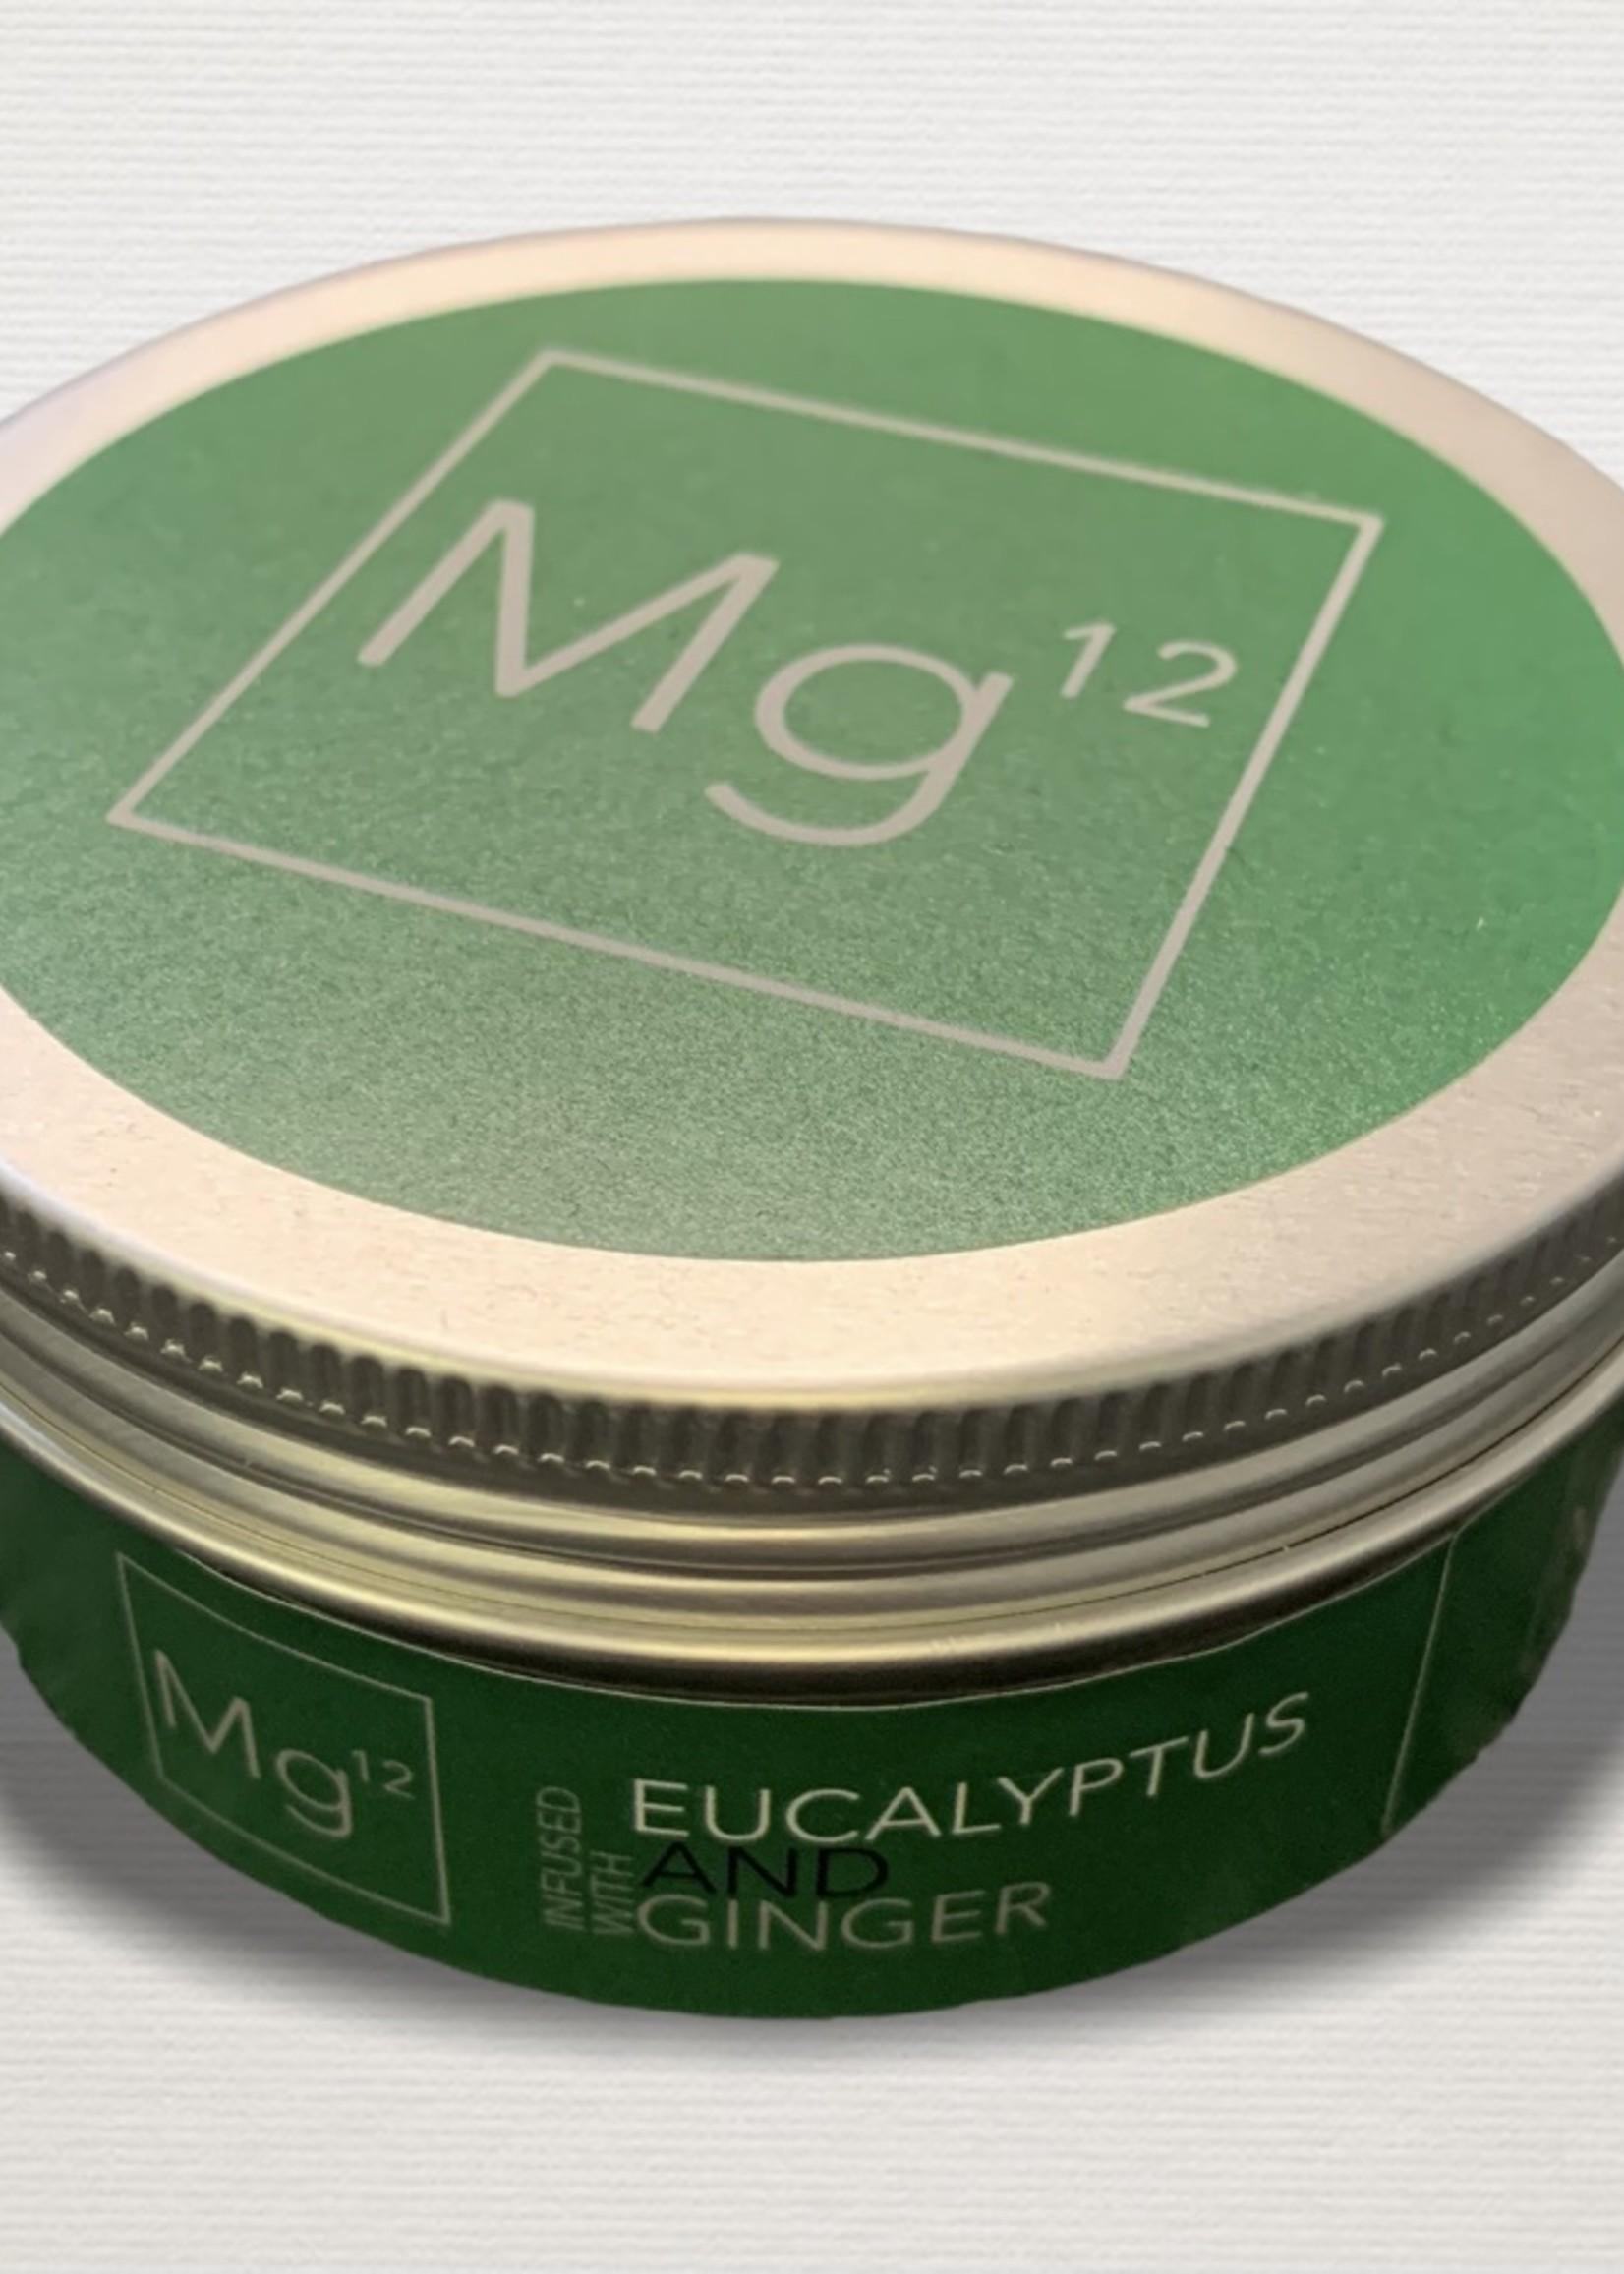 MG12 Mg12 Natural Magnesium - 150ml Gel